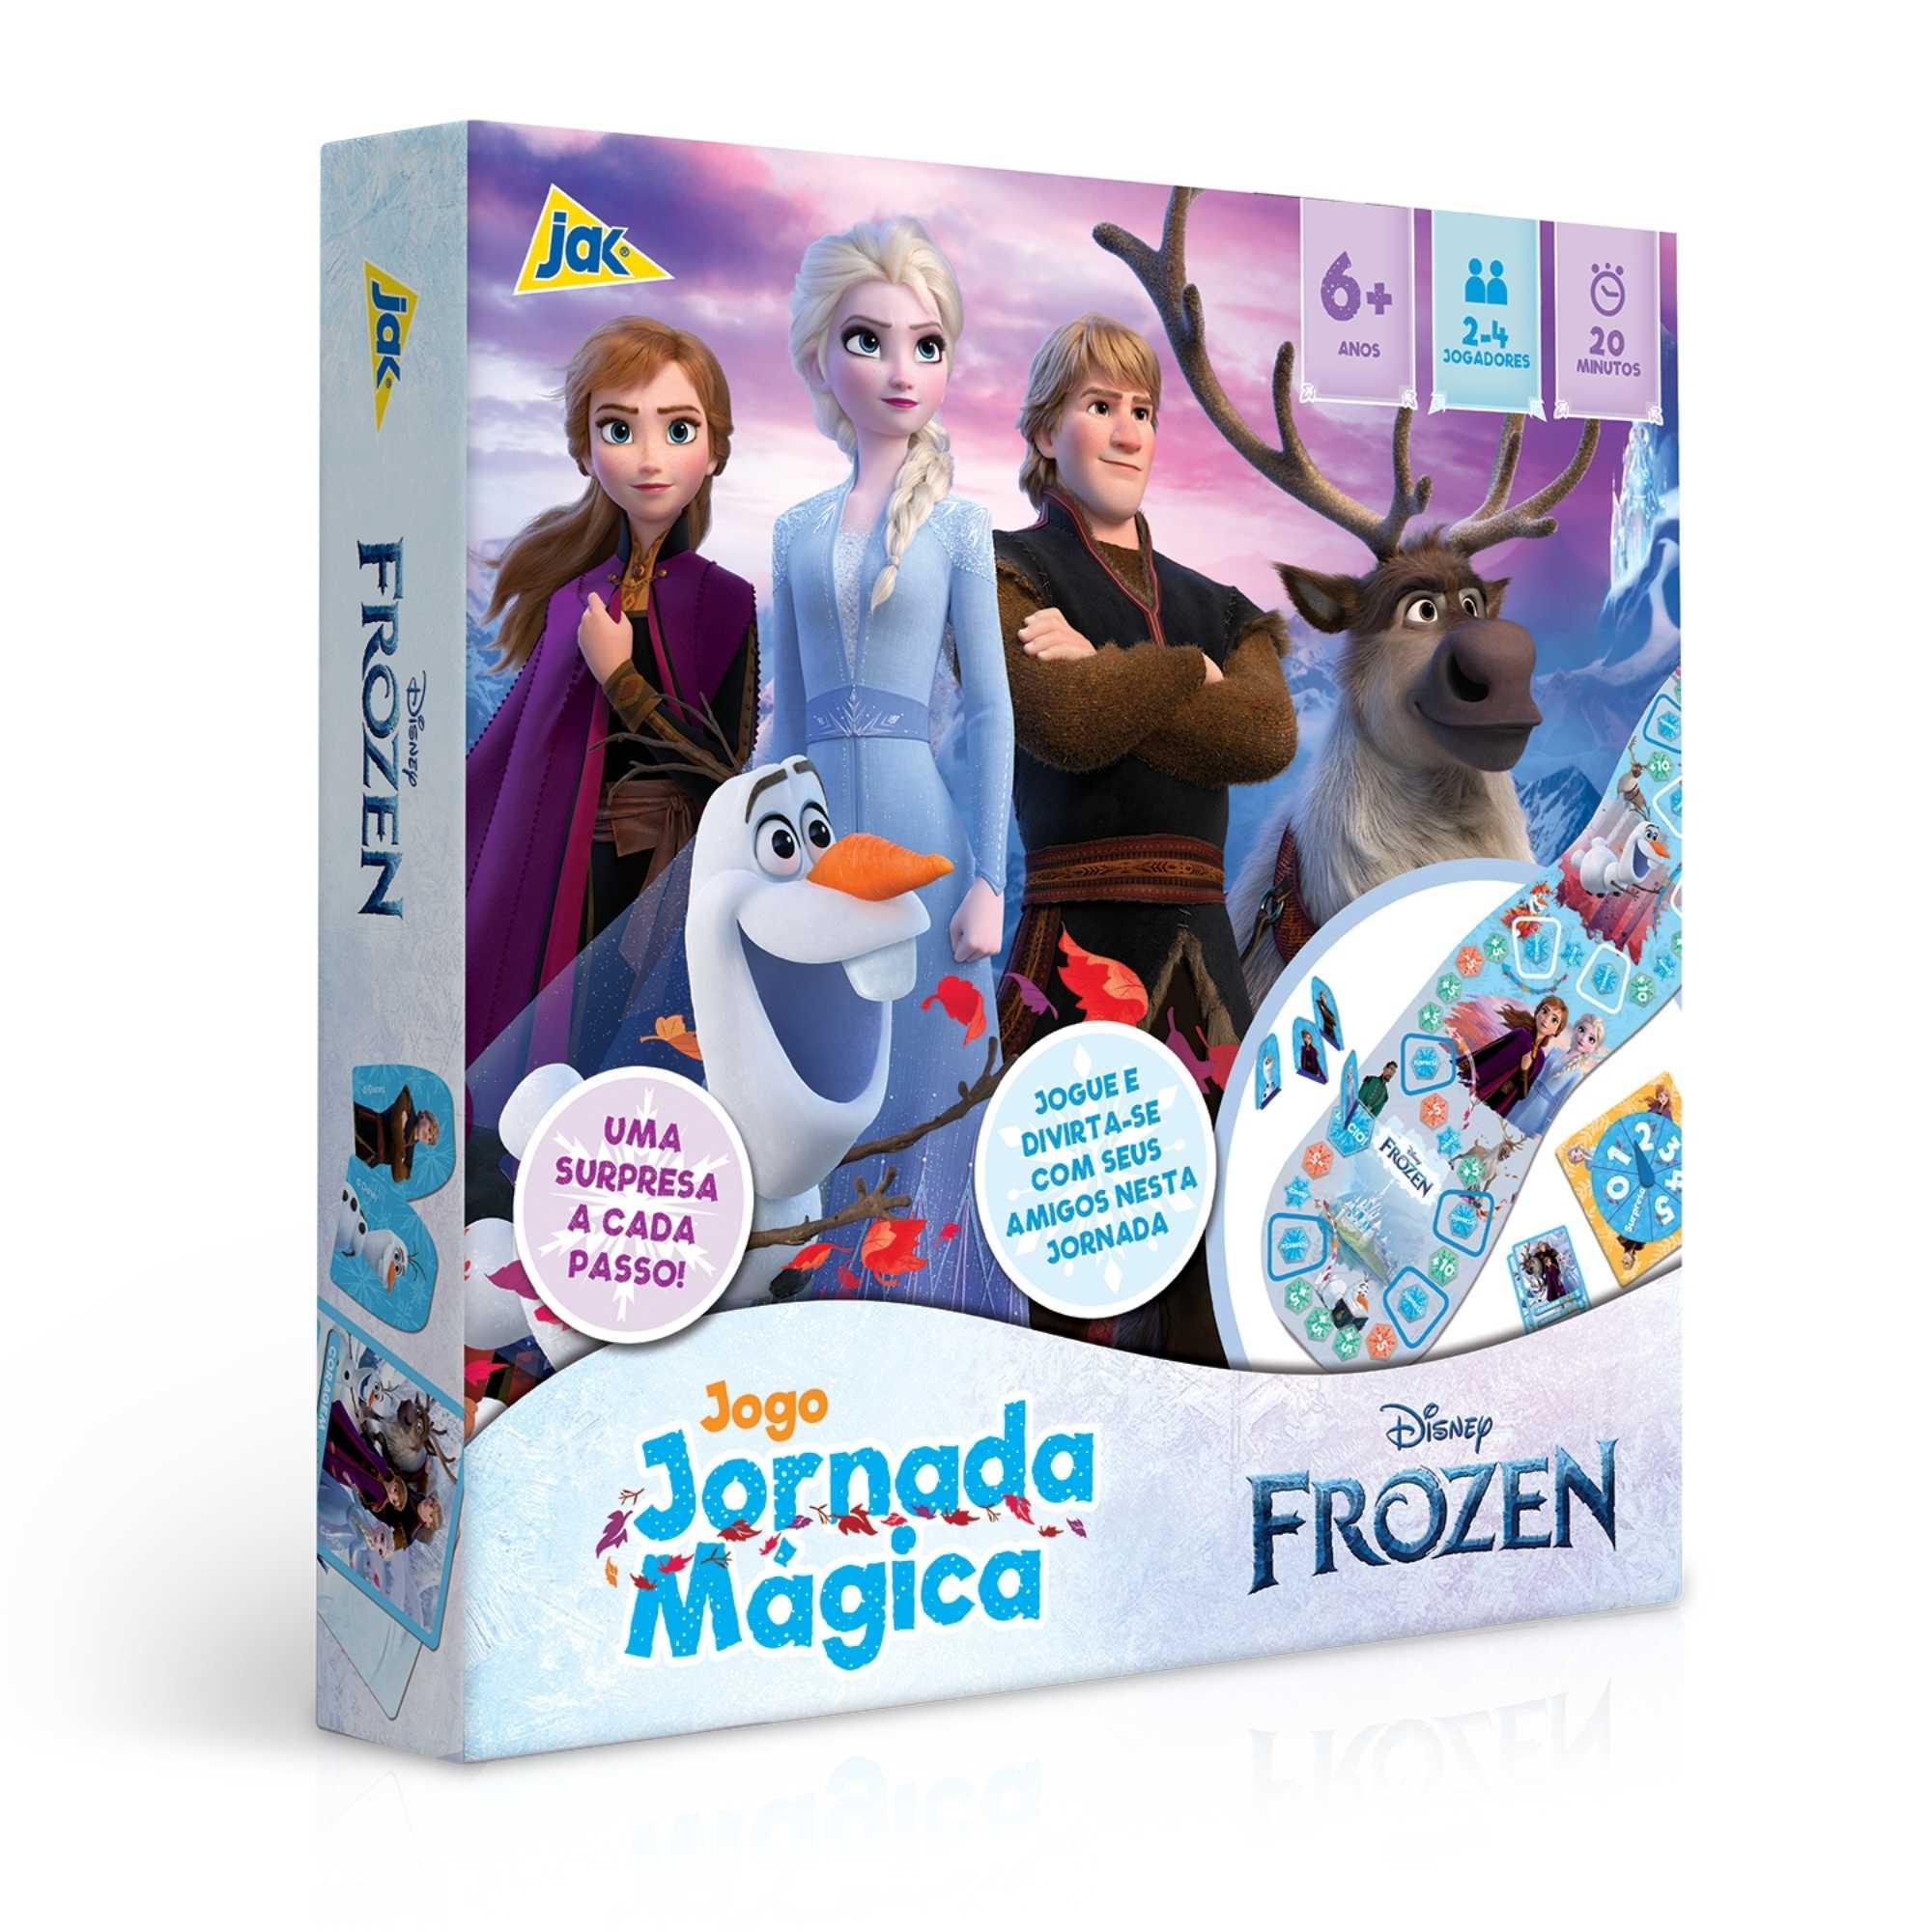 Jogo Jornada Mágica Frozen 2 - Jak